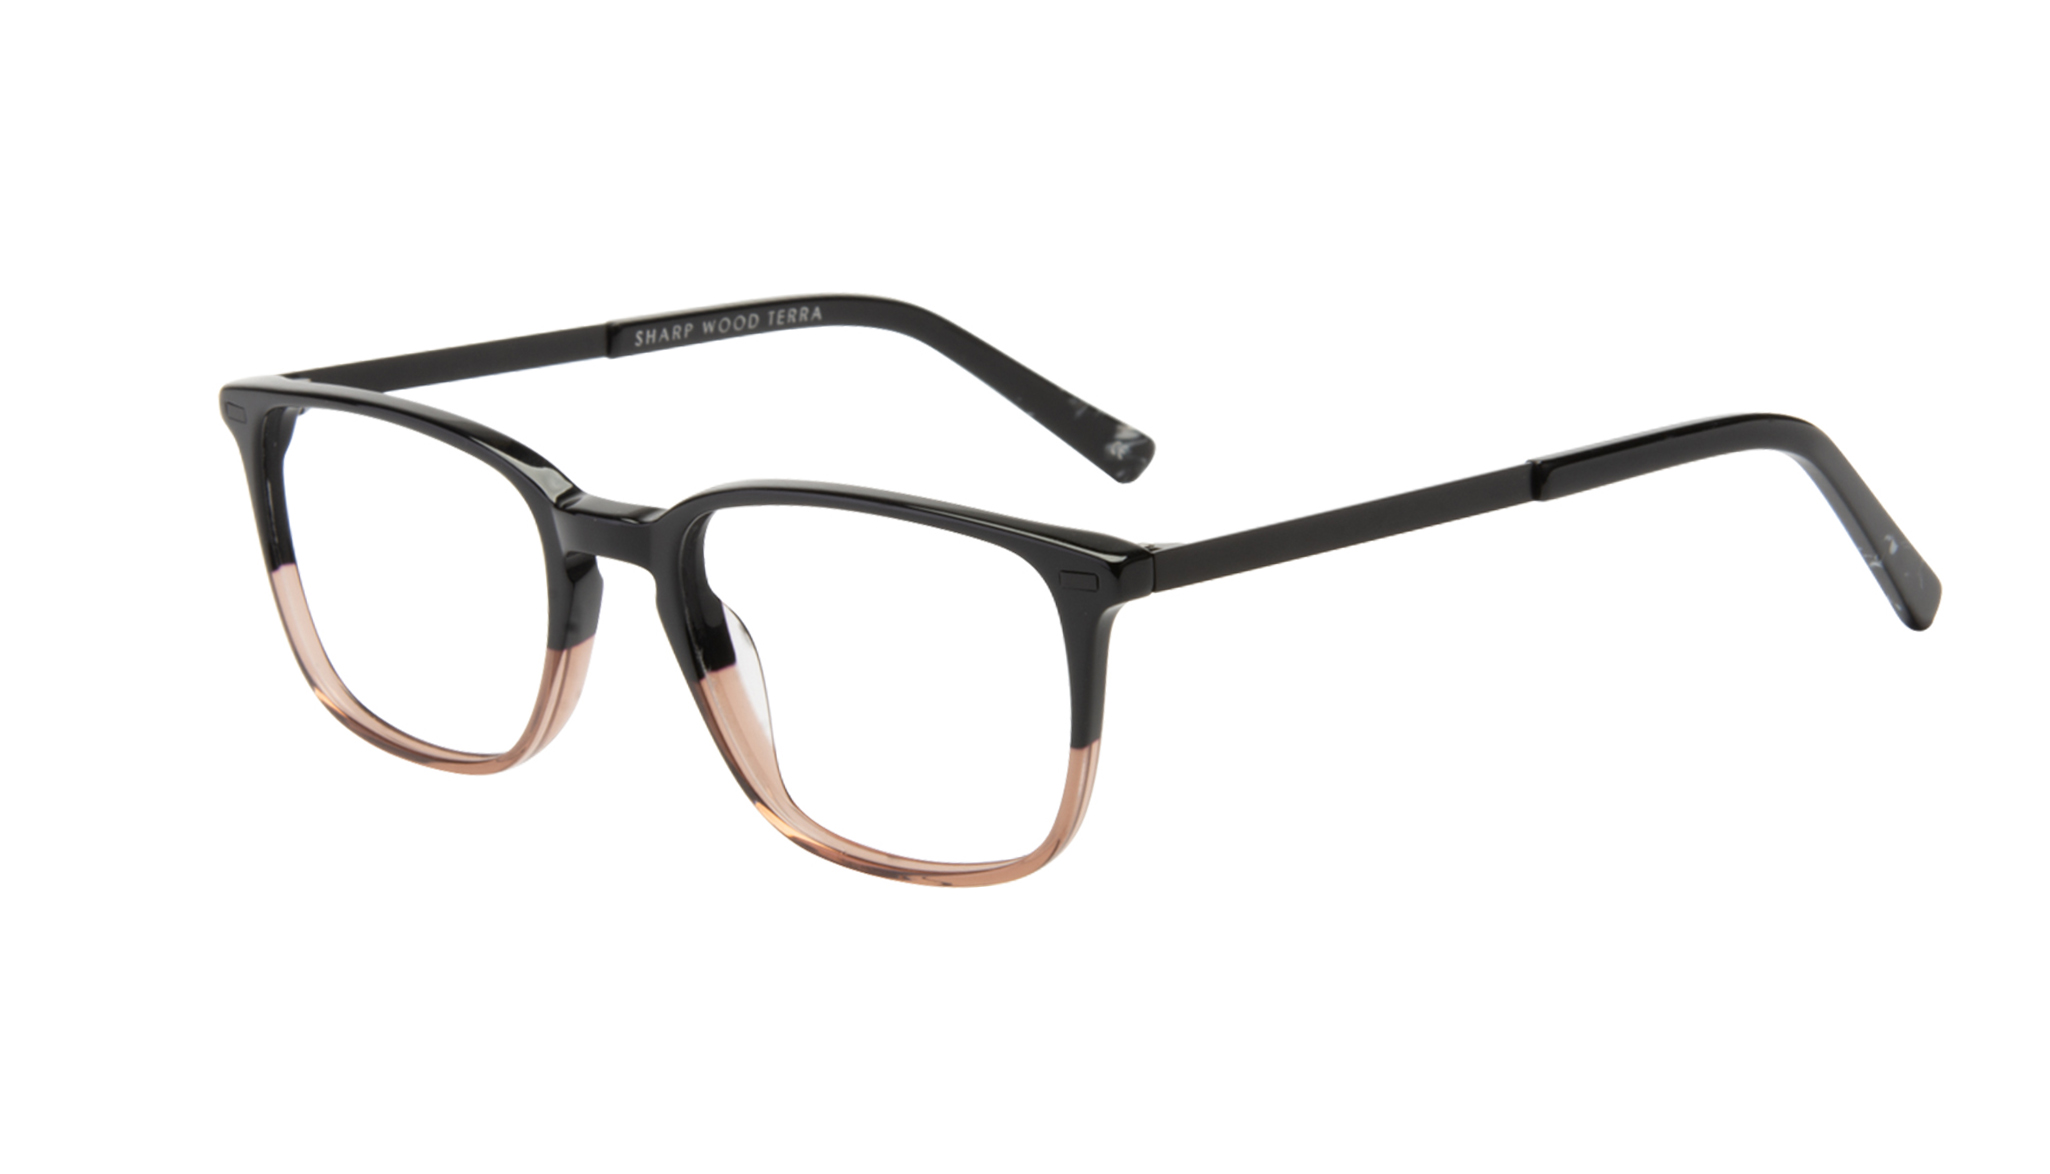 36067bb49a Affordable fashion glasses rectangle eyeglasses men sharp wood terra tilt  jpg 1600x707 Glasses foe wood